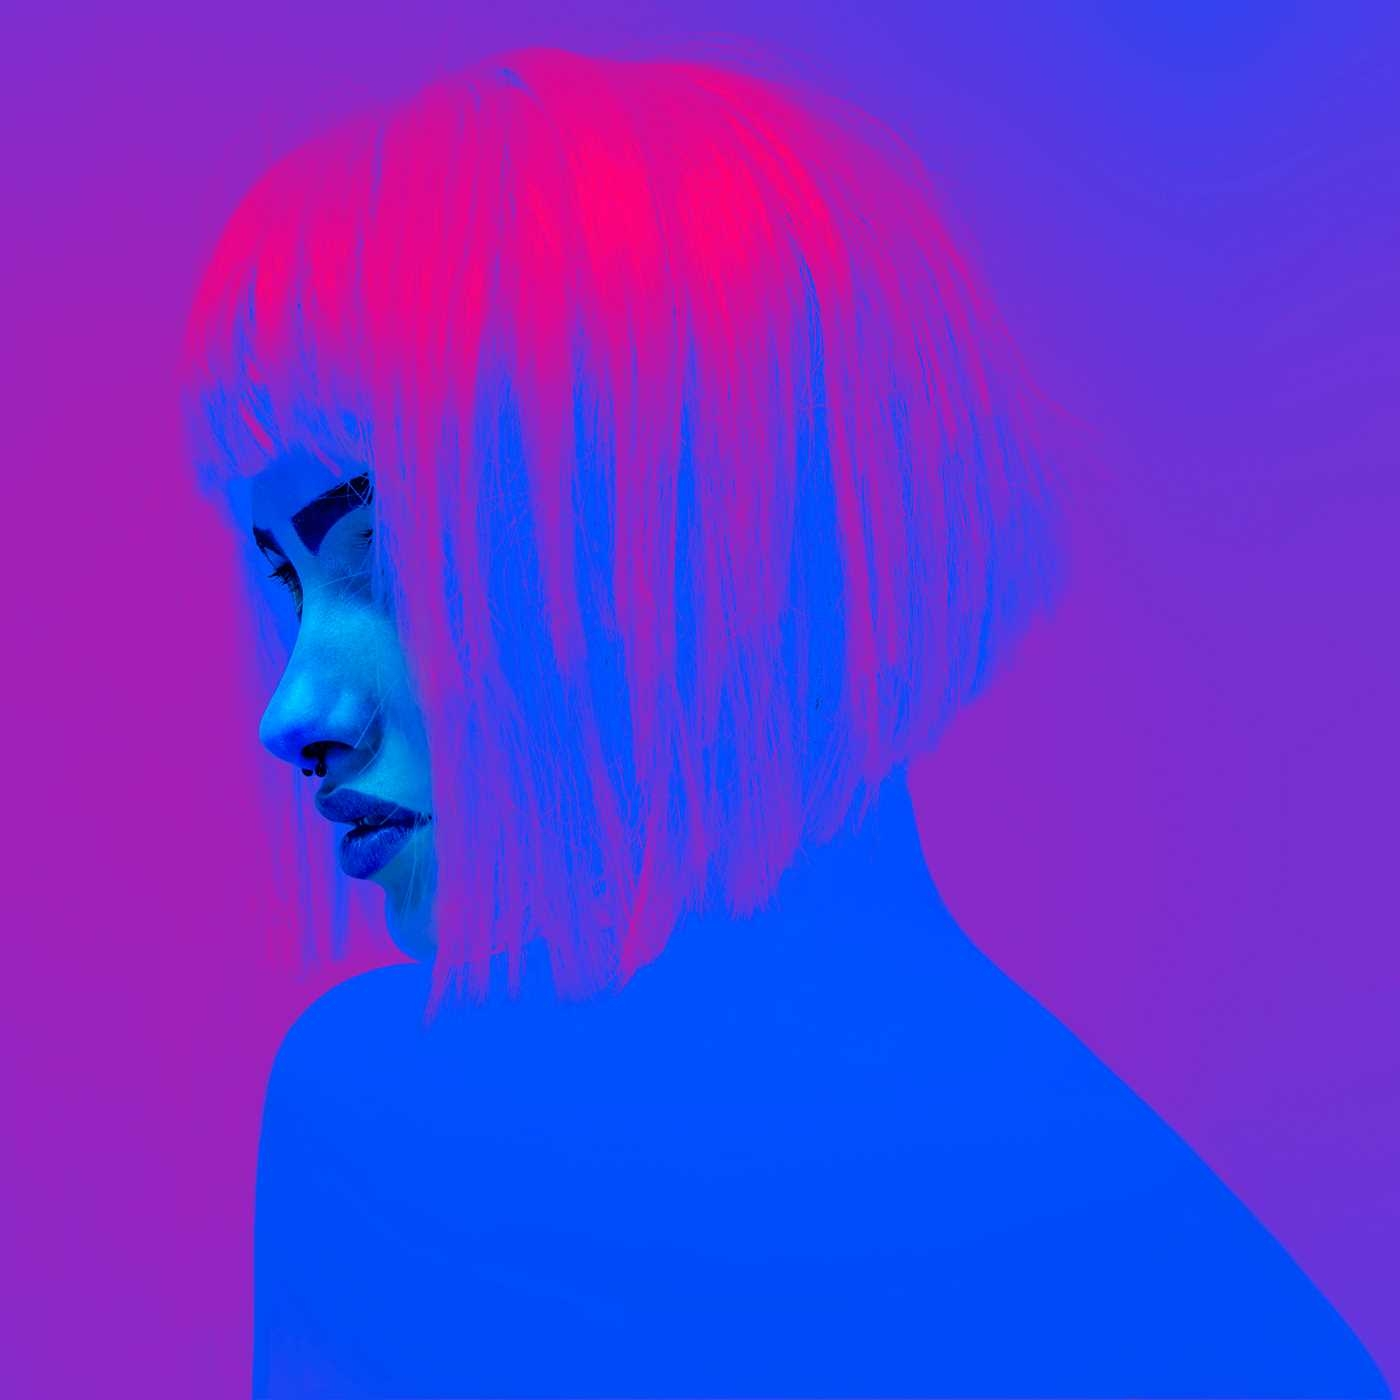 Colors: Cosmic Photography Slav - photogrist | ello